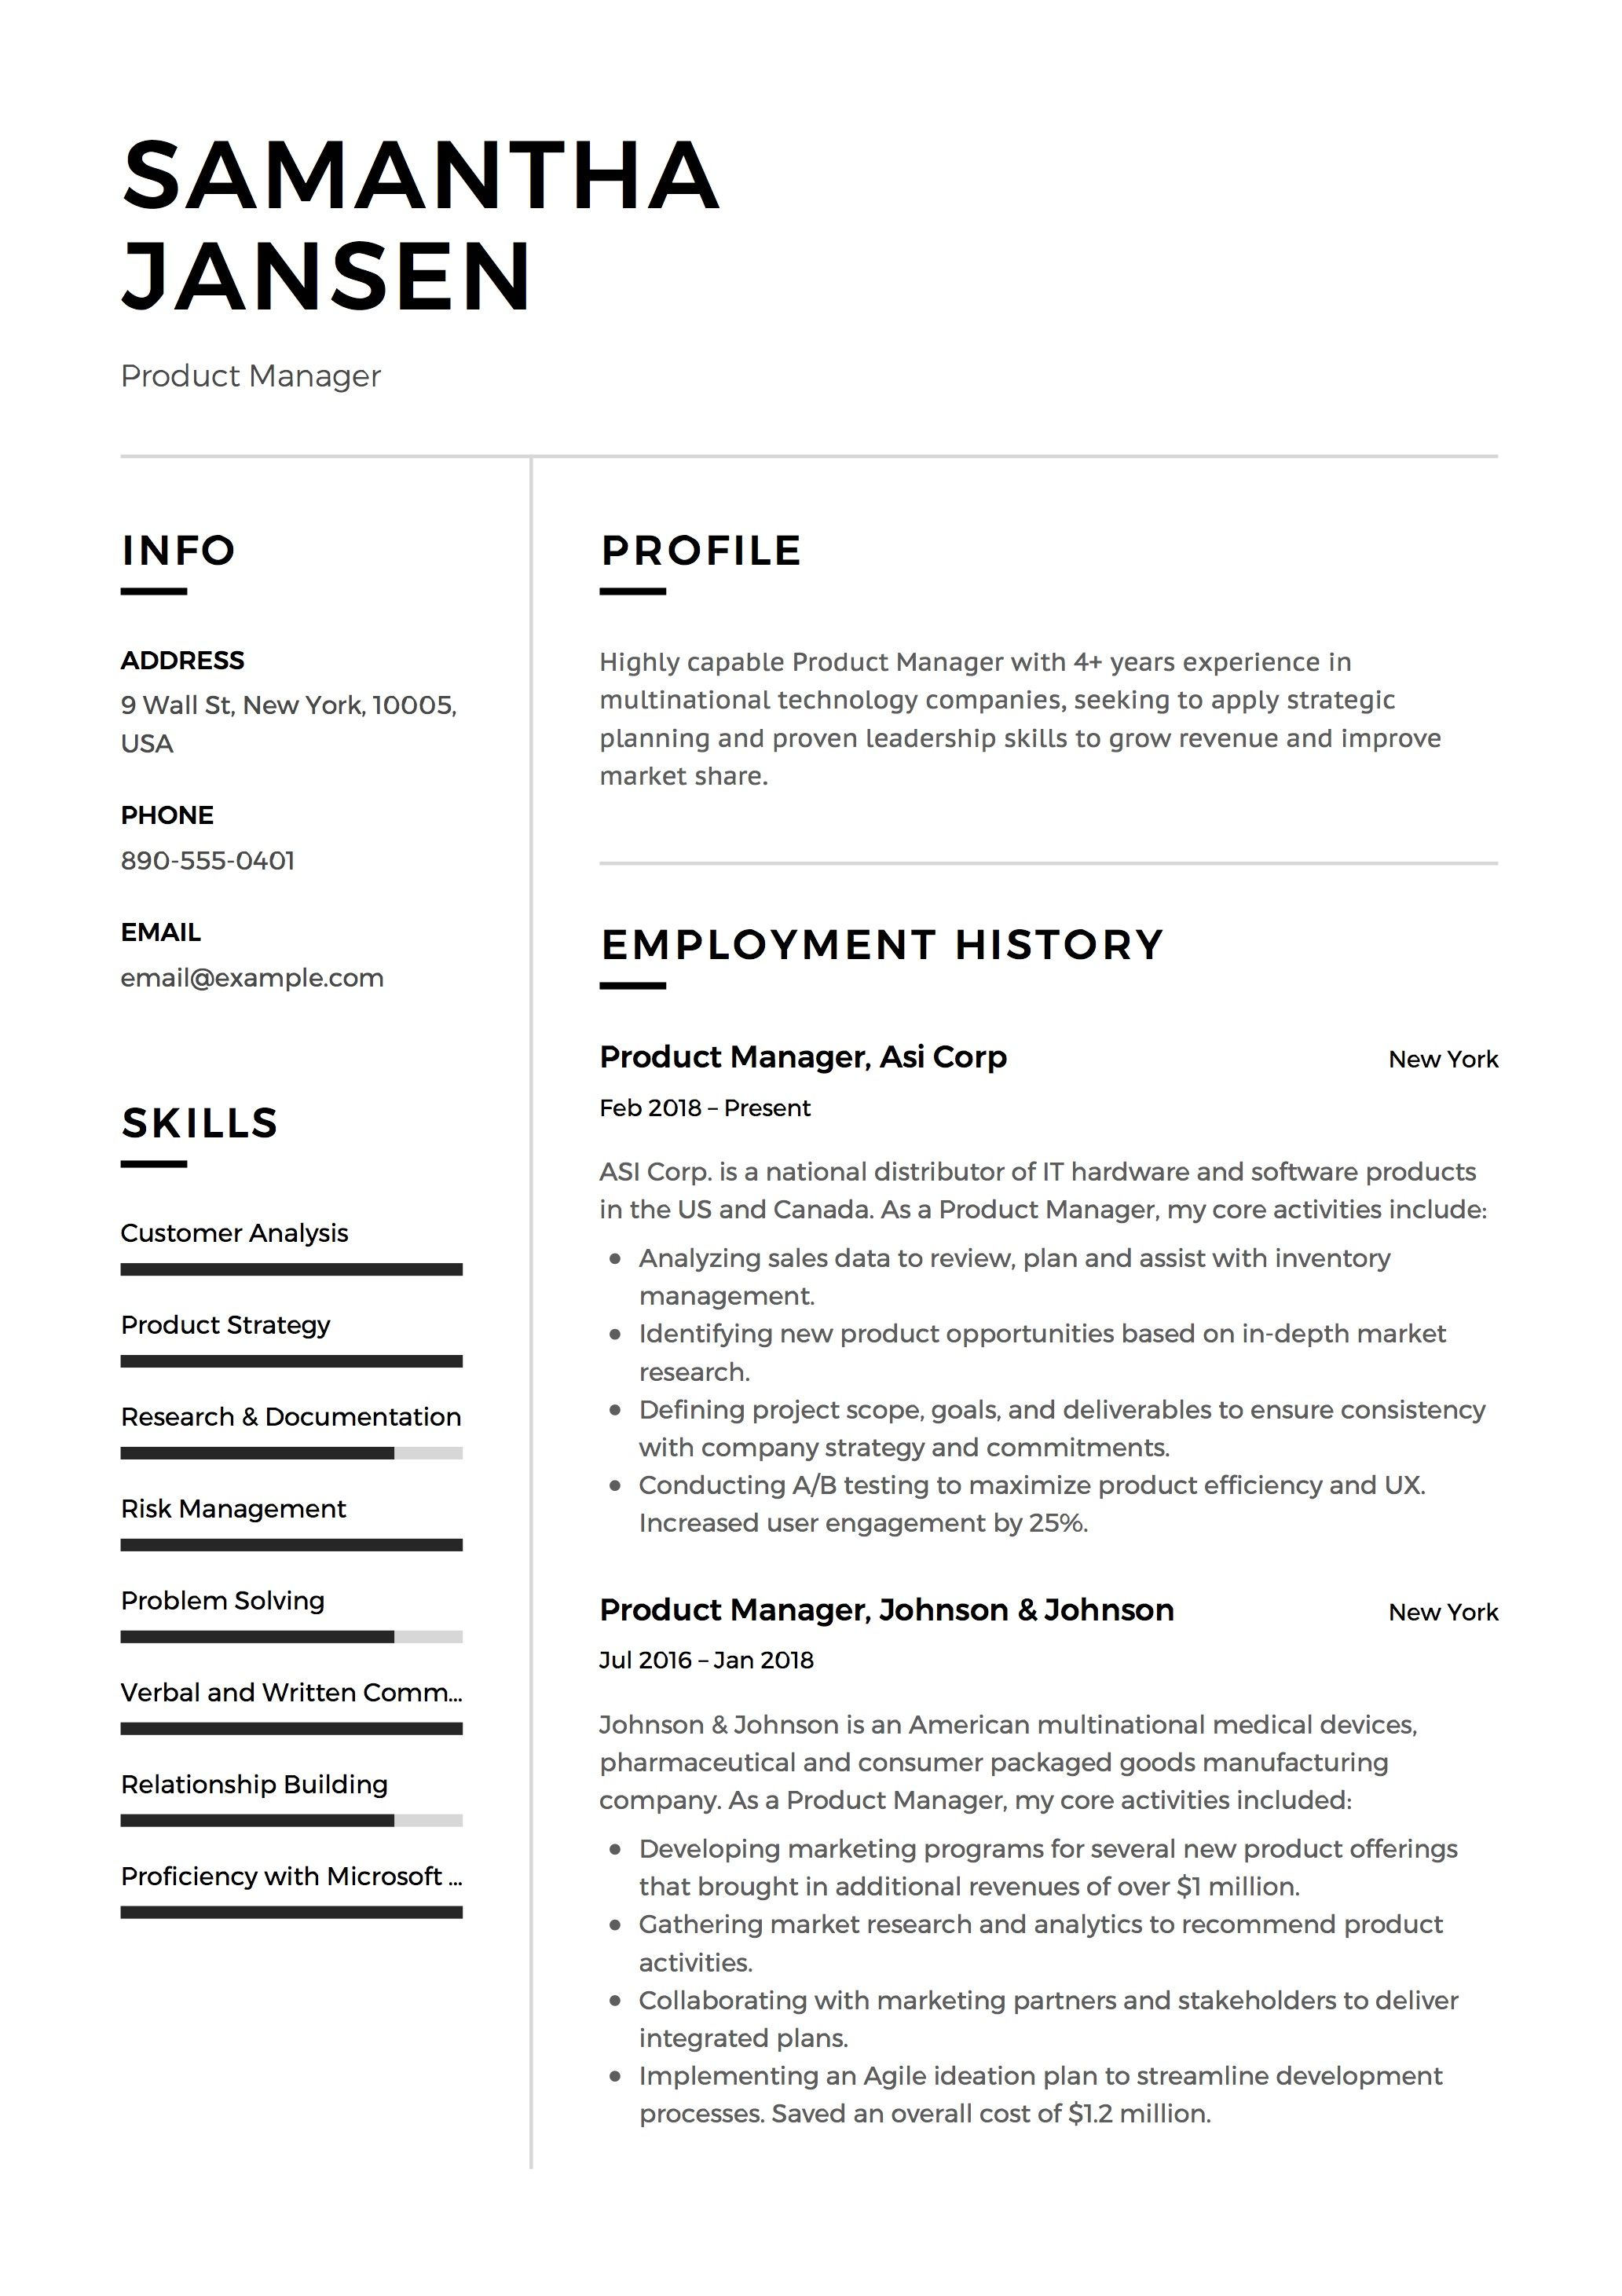 Resume Writing Free Images